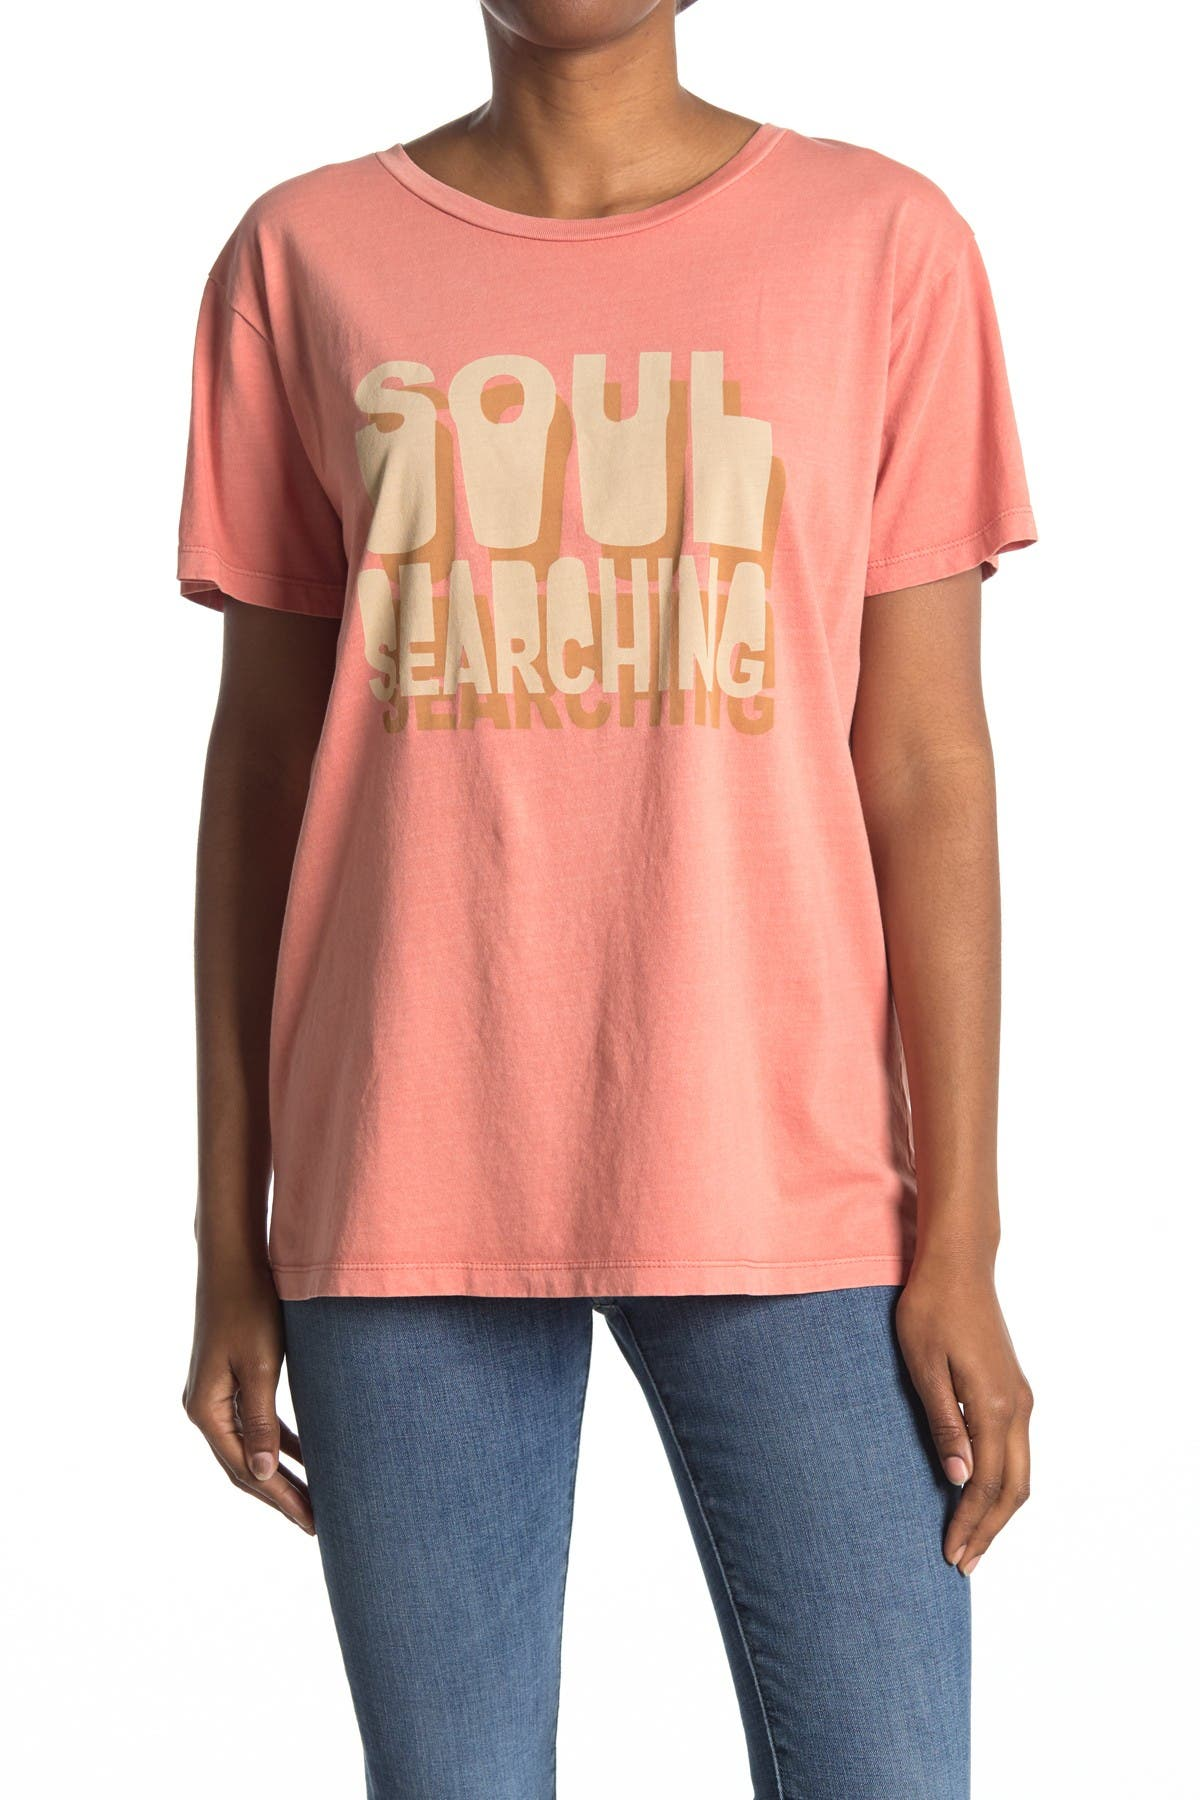 Image of Desert Dreamer Soul Searching Graphic Crew Neck T-Shirt